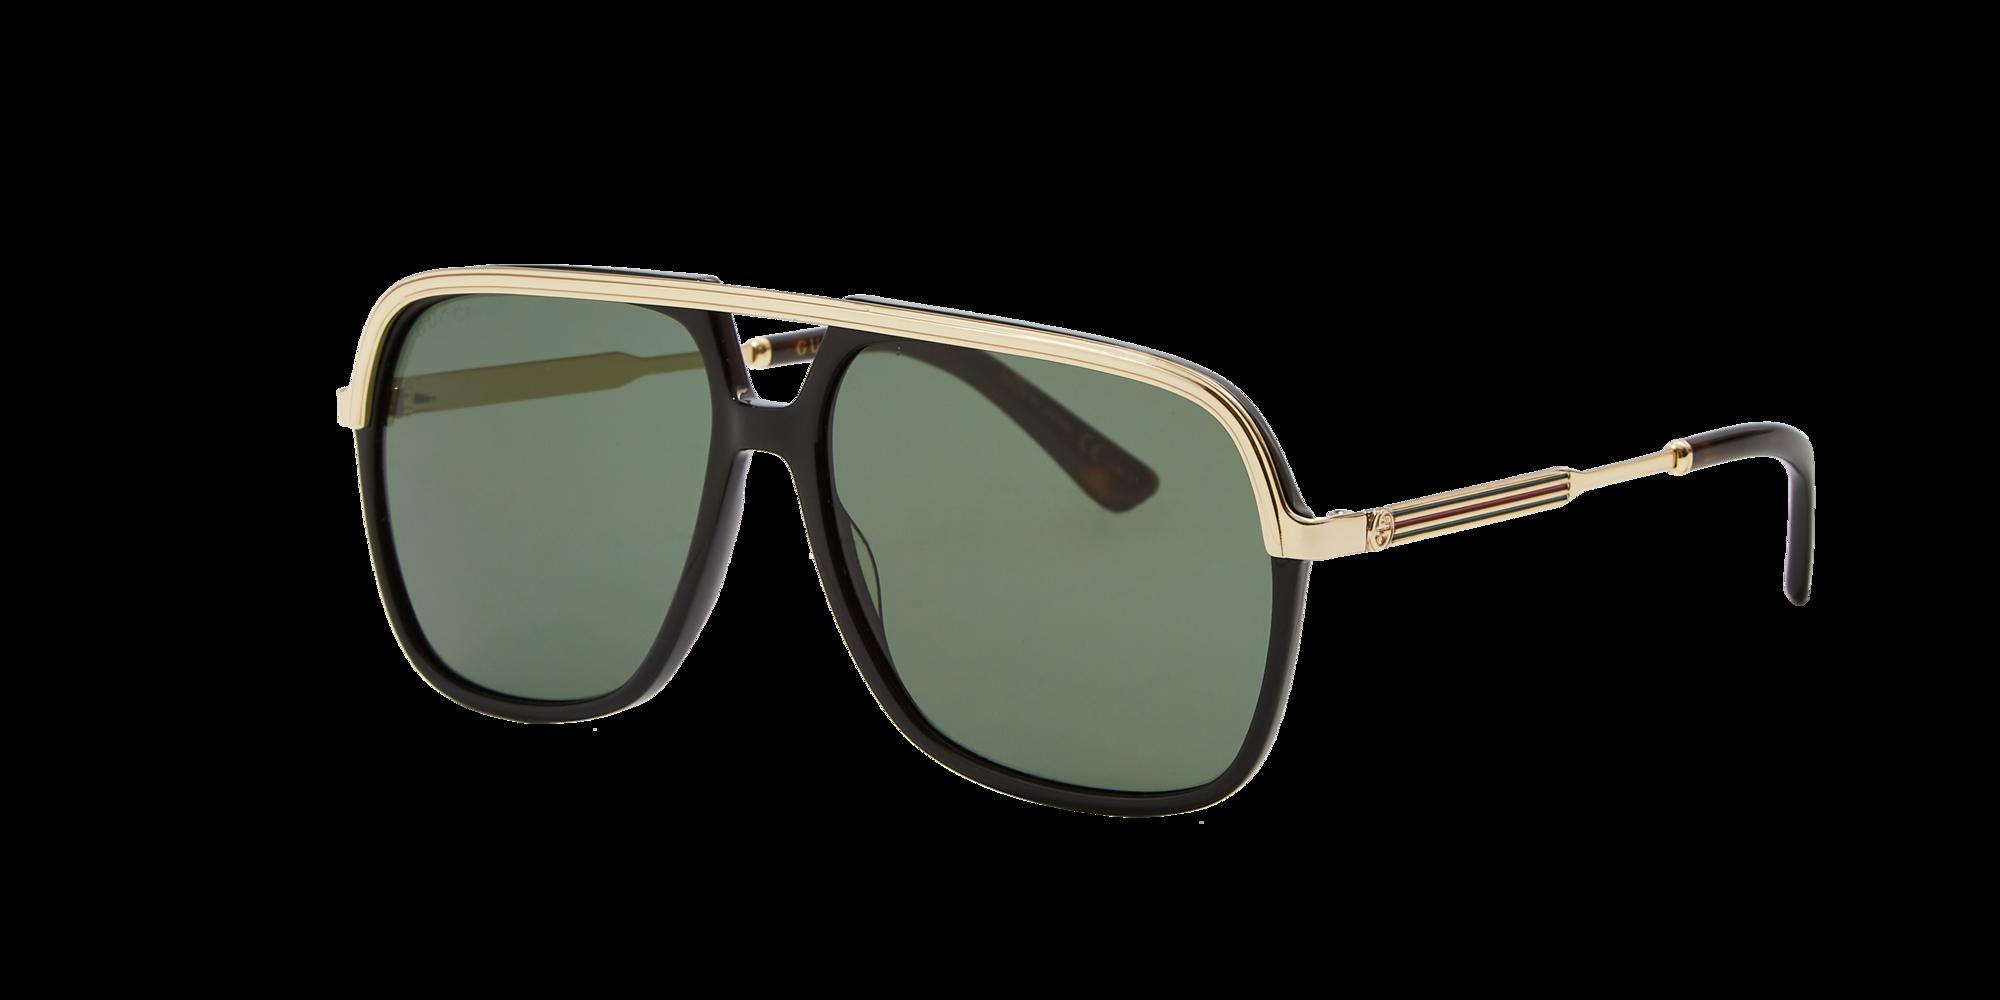 Gucci Unisex  GG0200S -  Frame color  Black, Lens color  Green, Size 57-14 145